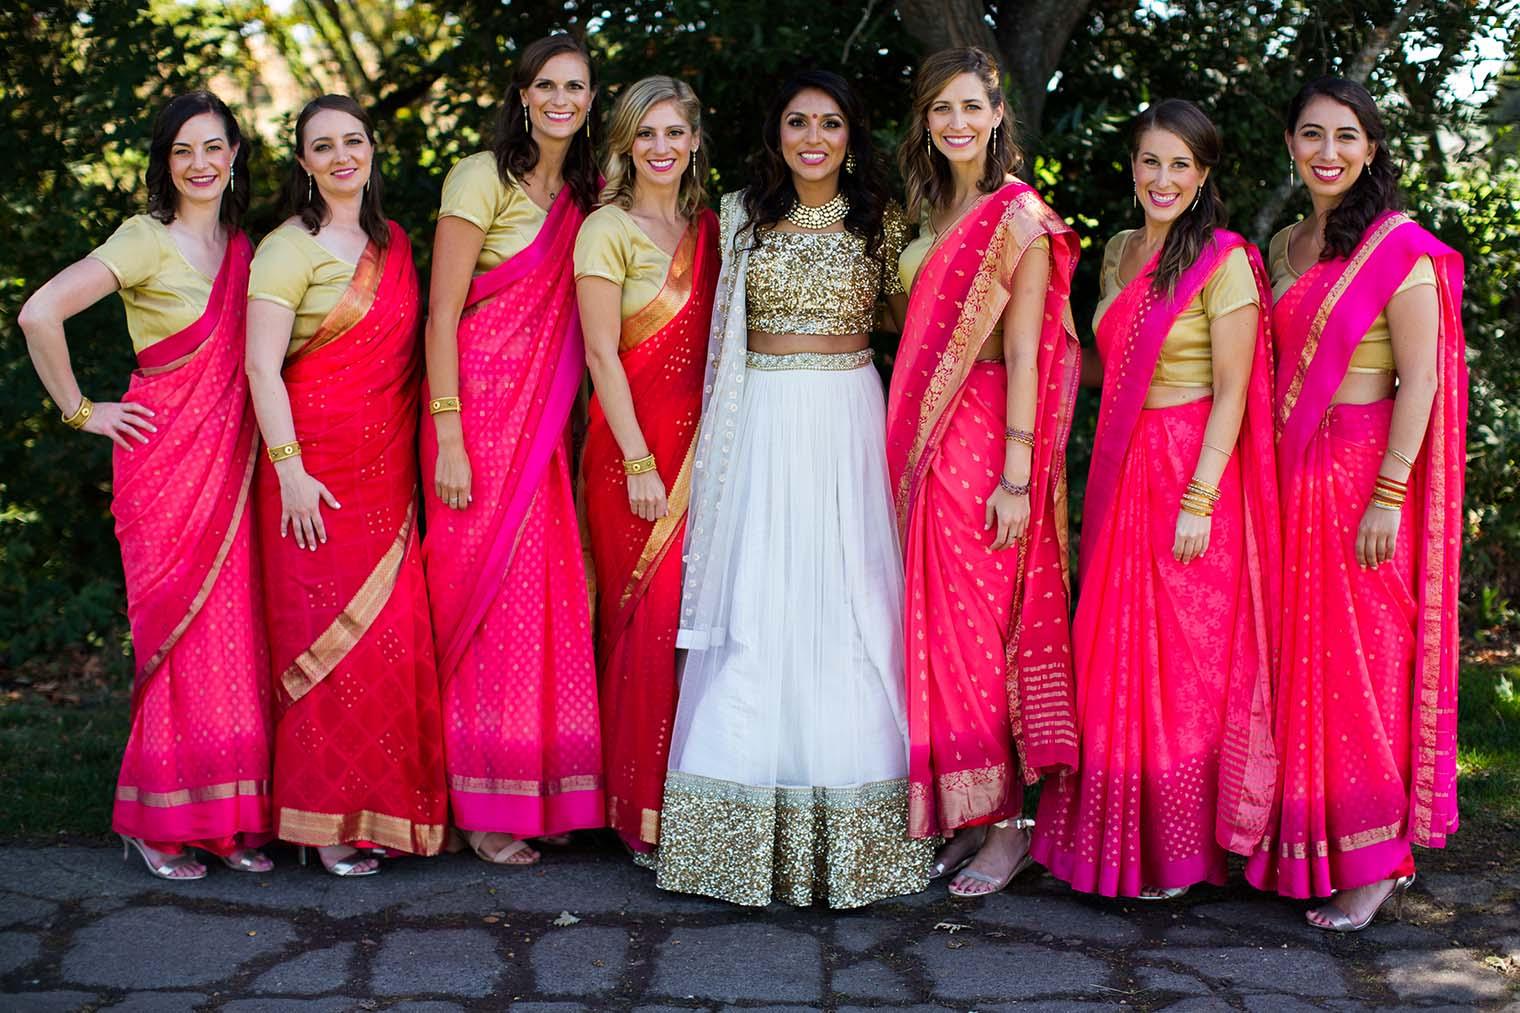 Bride and Bridemaids at Chardonnay Golf Club and Vineyards